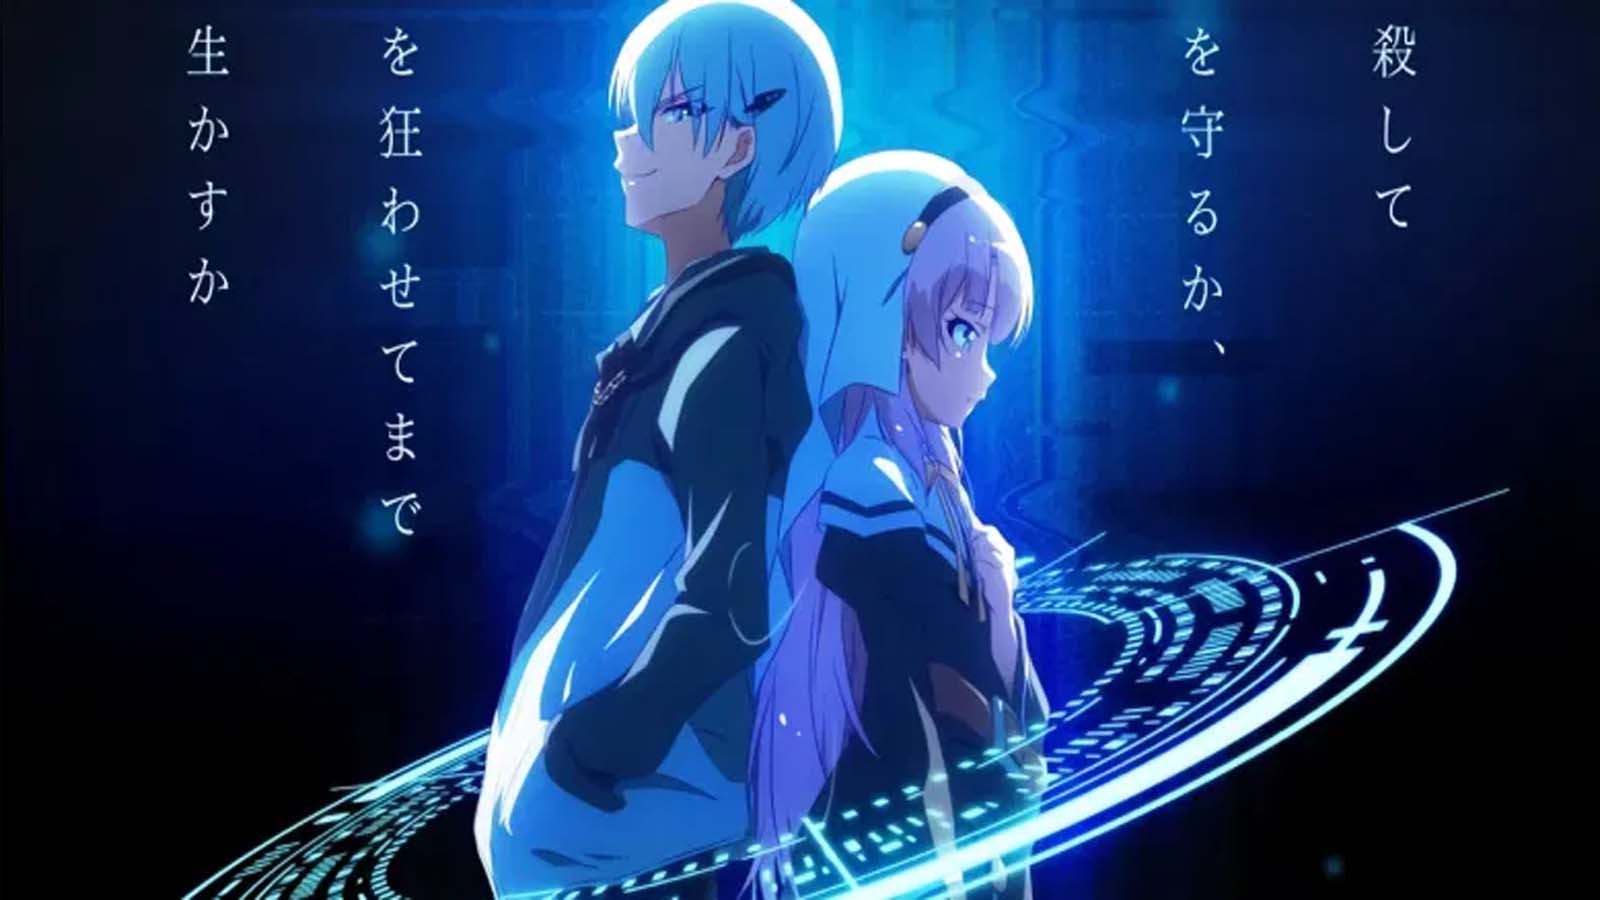 mejores animes de noviembre 2020